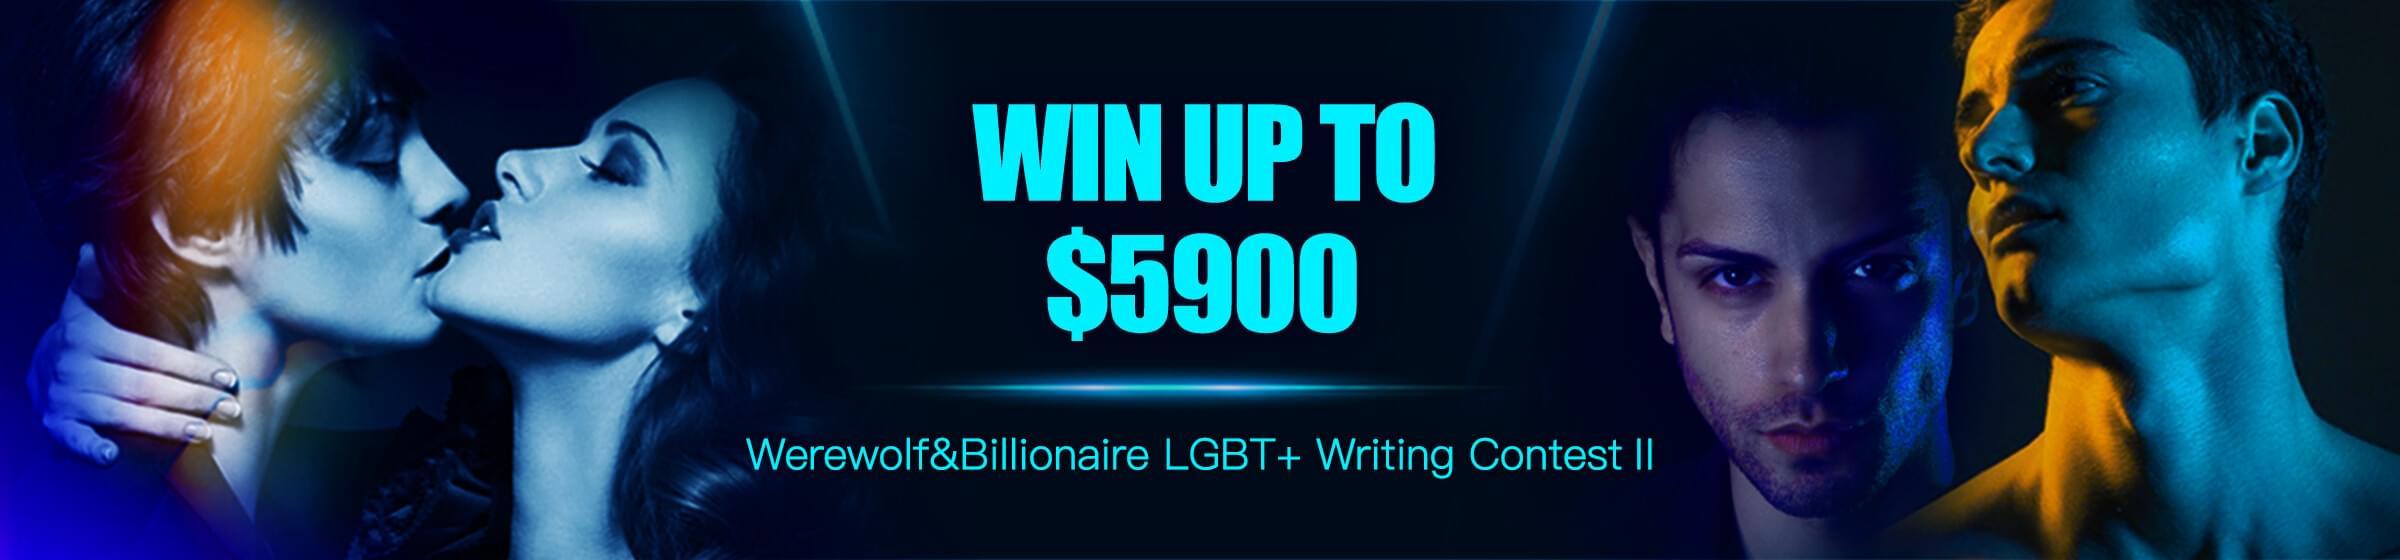 Werewolf/Billionaire LGBT+ Writing Contest Ⅱ@#091418@#091418